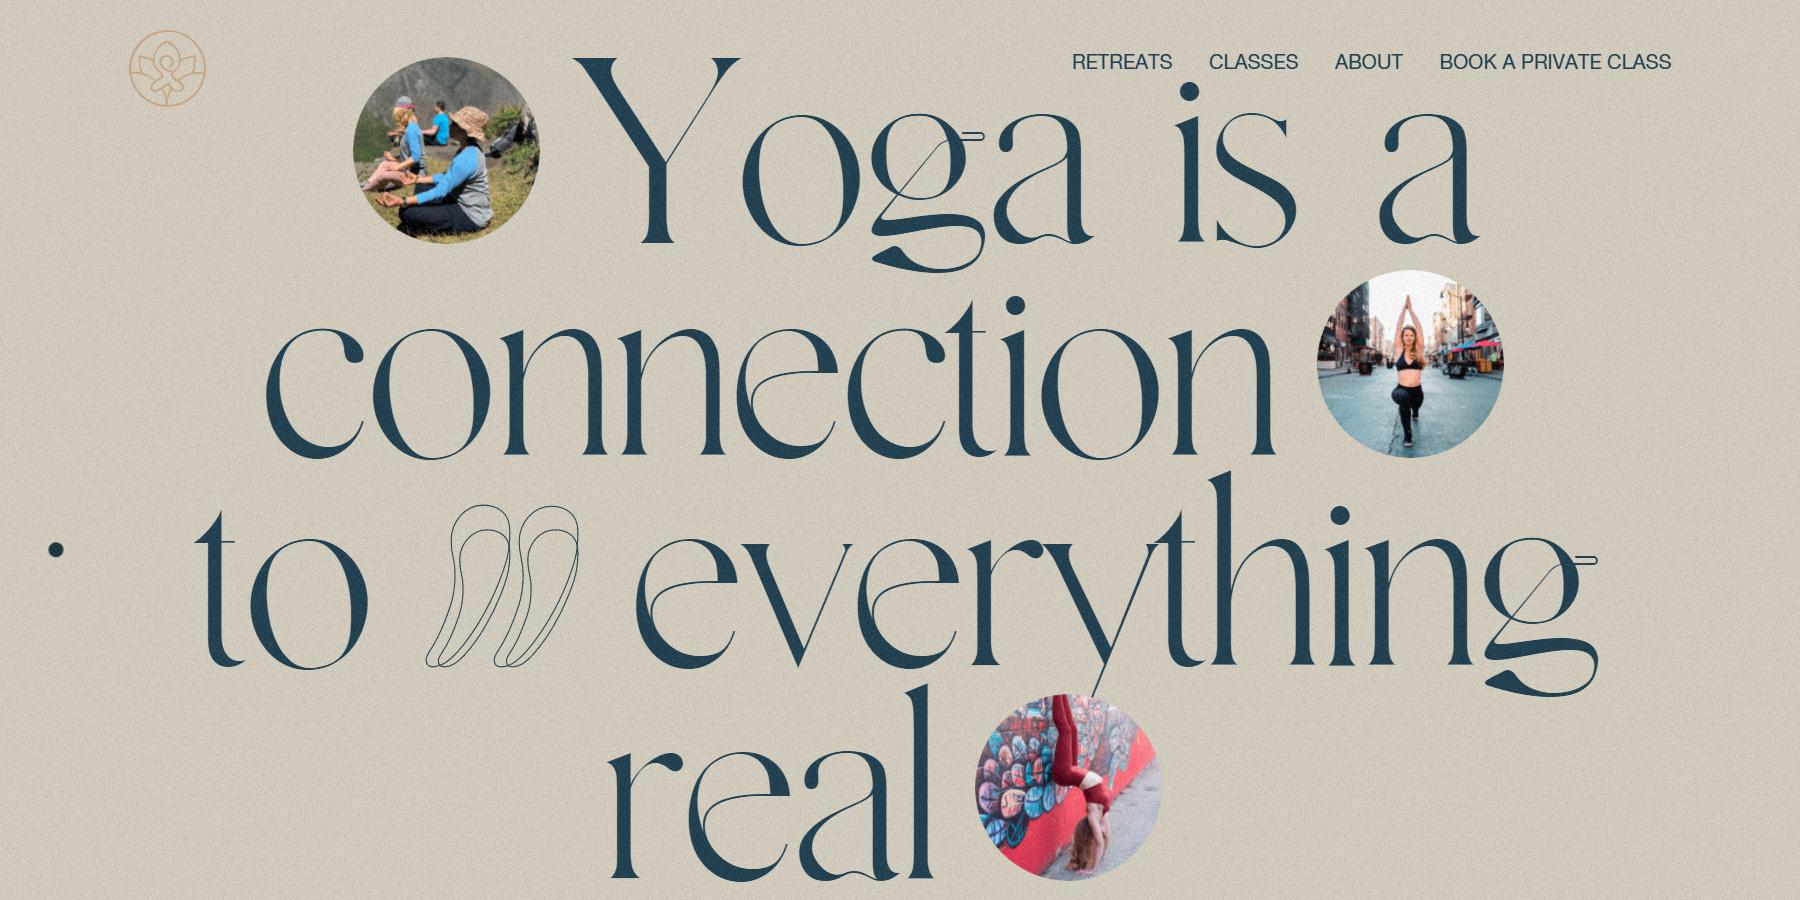 Hoboken Yogi - Website of the Day